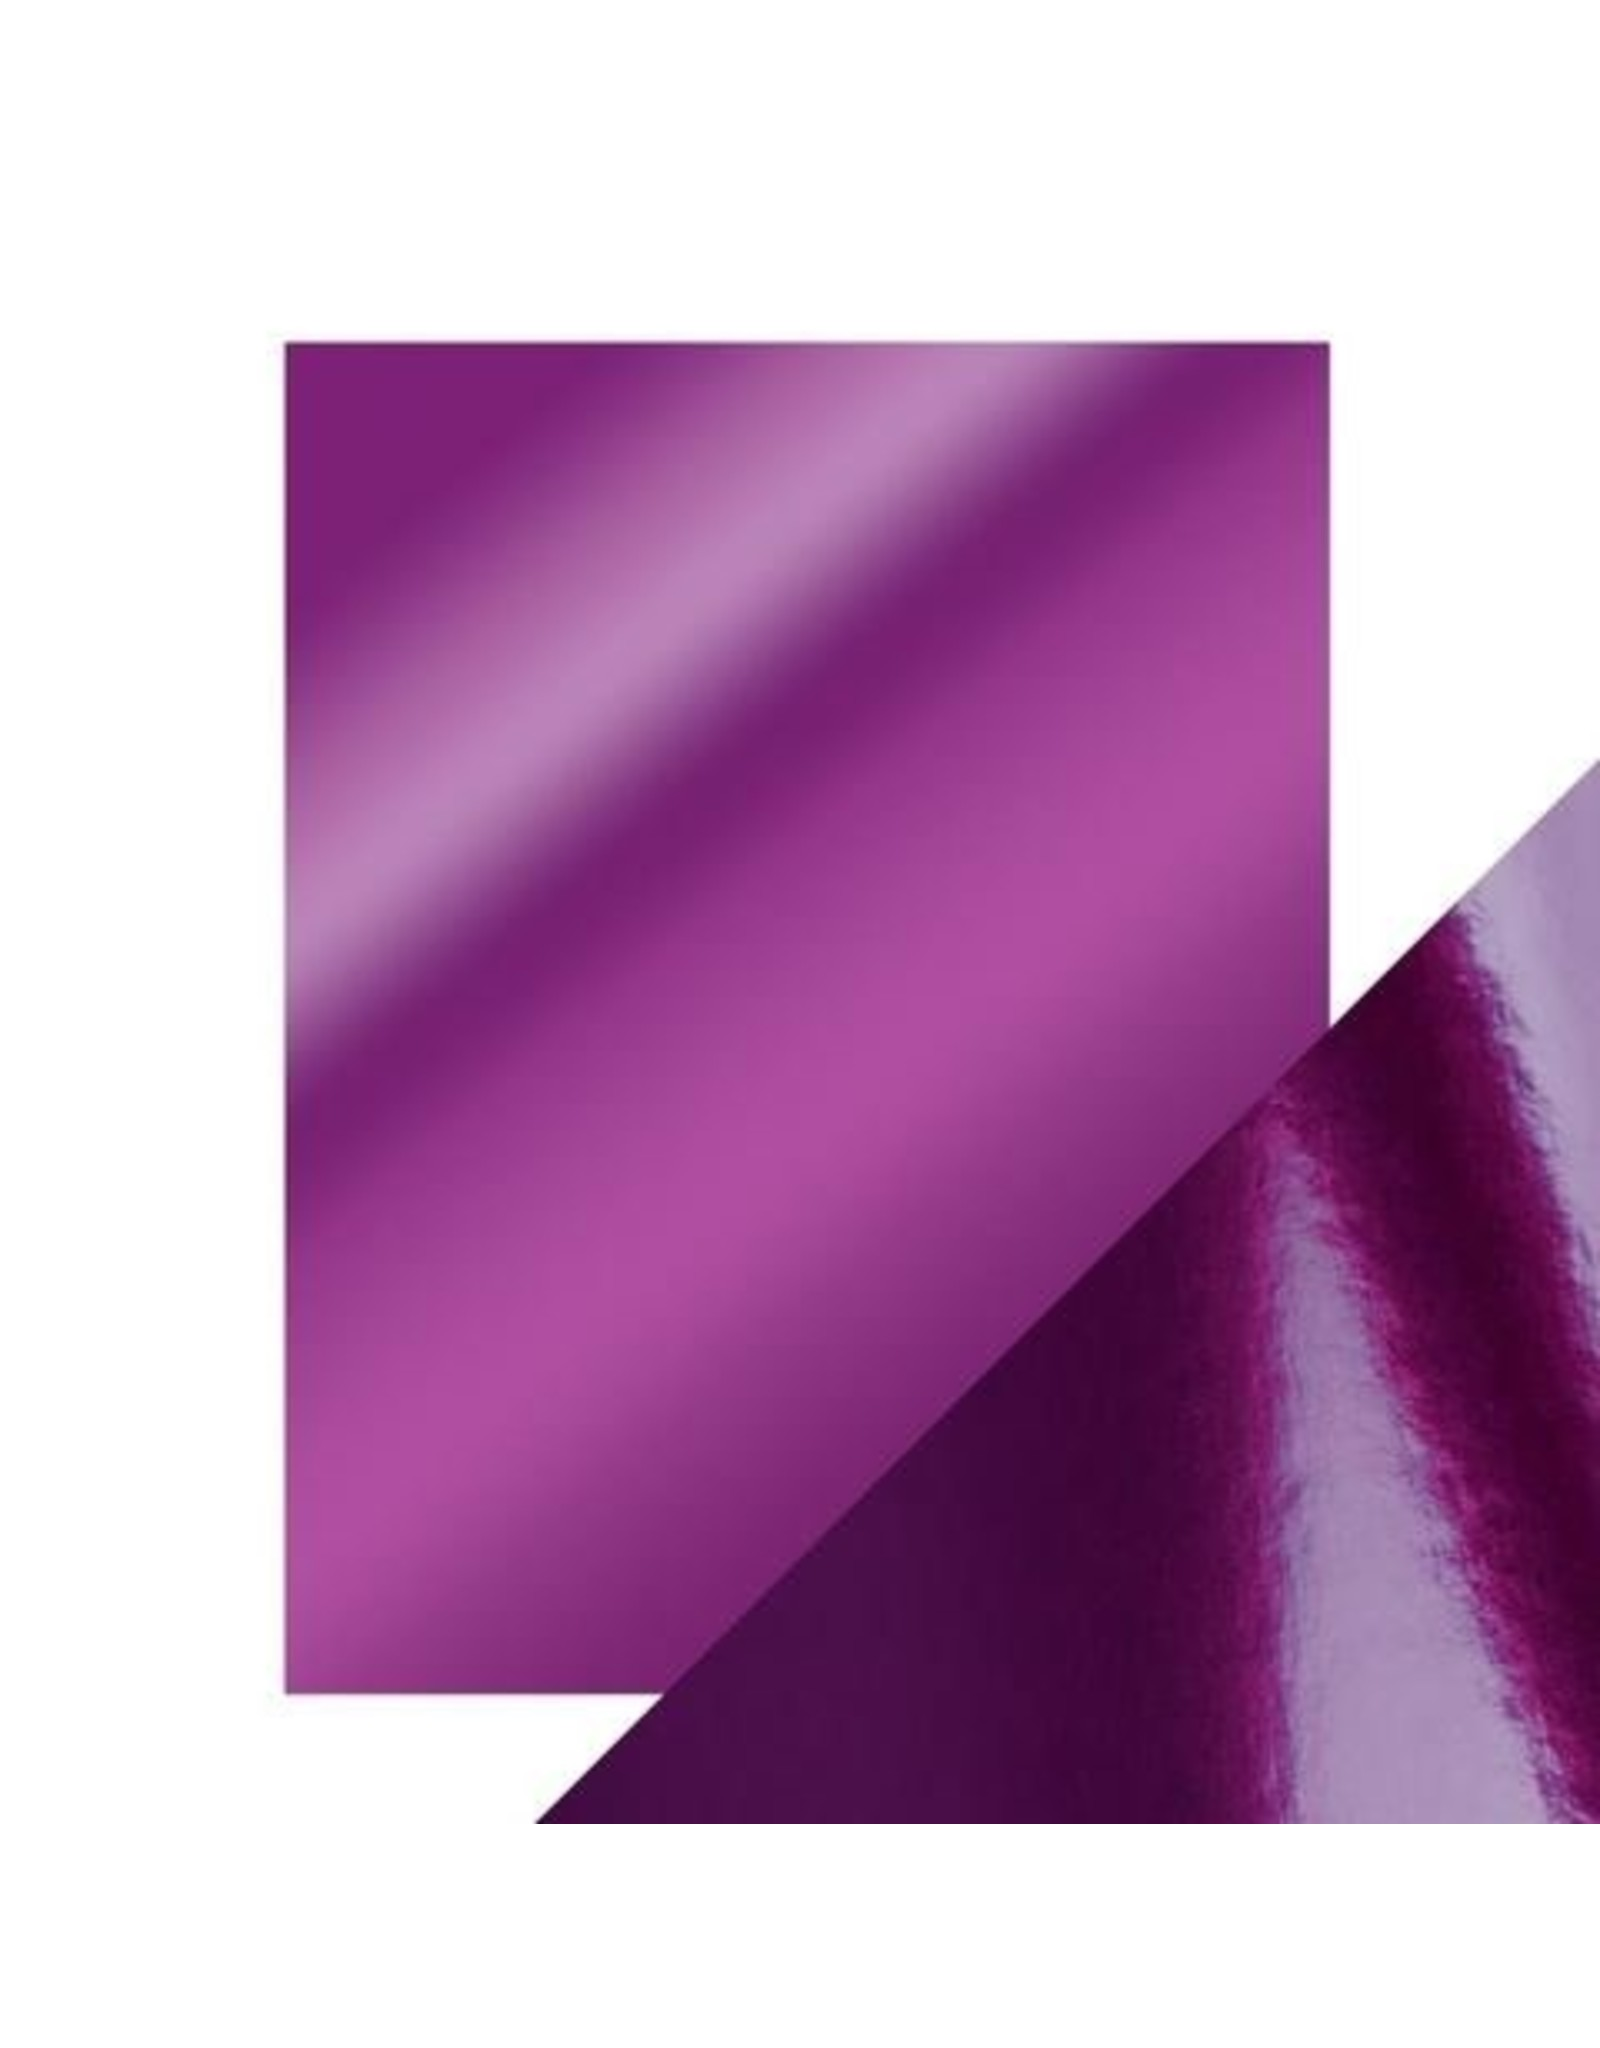 8.5X11 Mirror Cardstock, Gloss - Electric Purple (5/Pk)